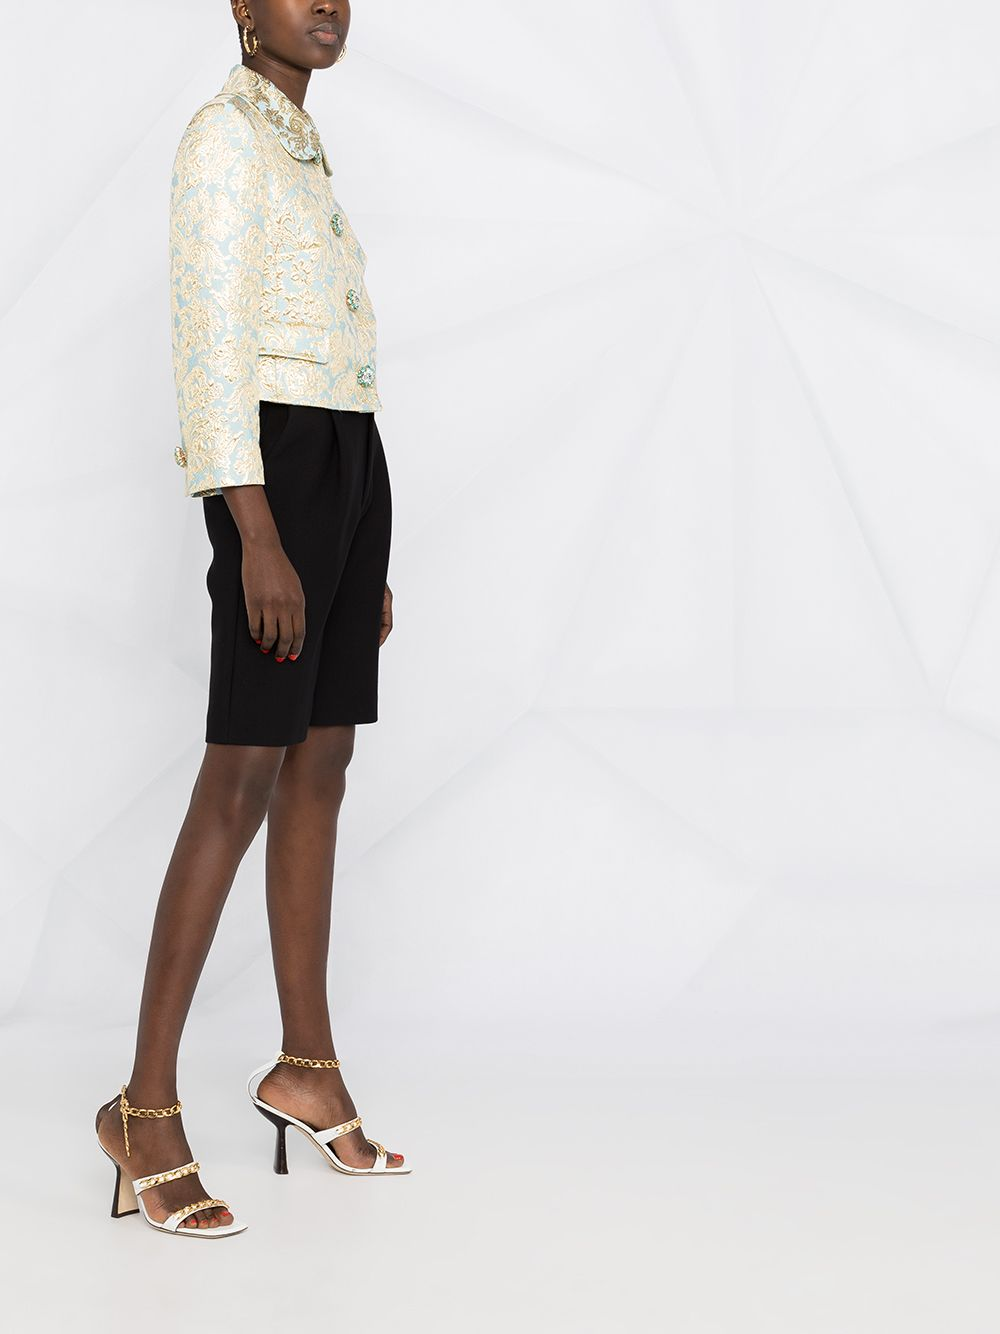 Azure and gold-tone stretch silk jacquard short fitted jacket  DOLCE & GABBANA |  | F26ALZ-HJMLBS8351